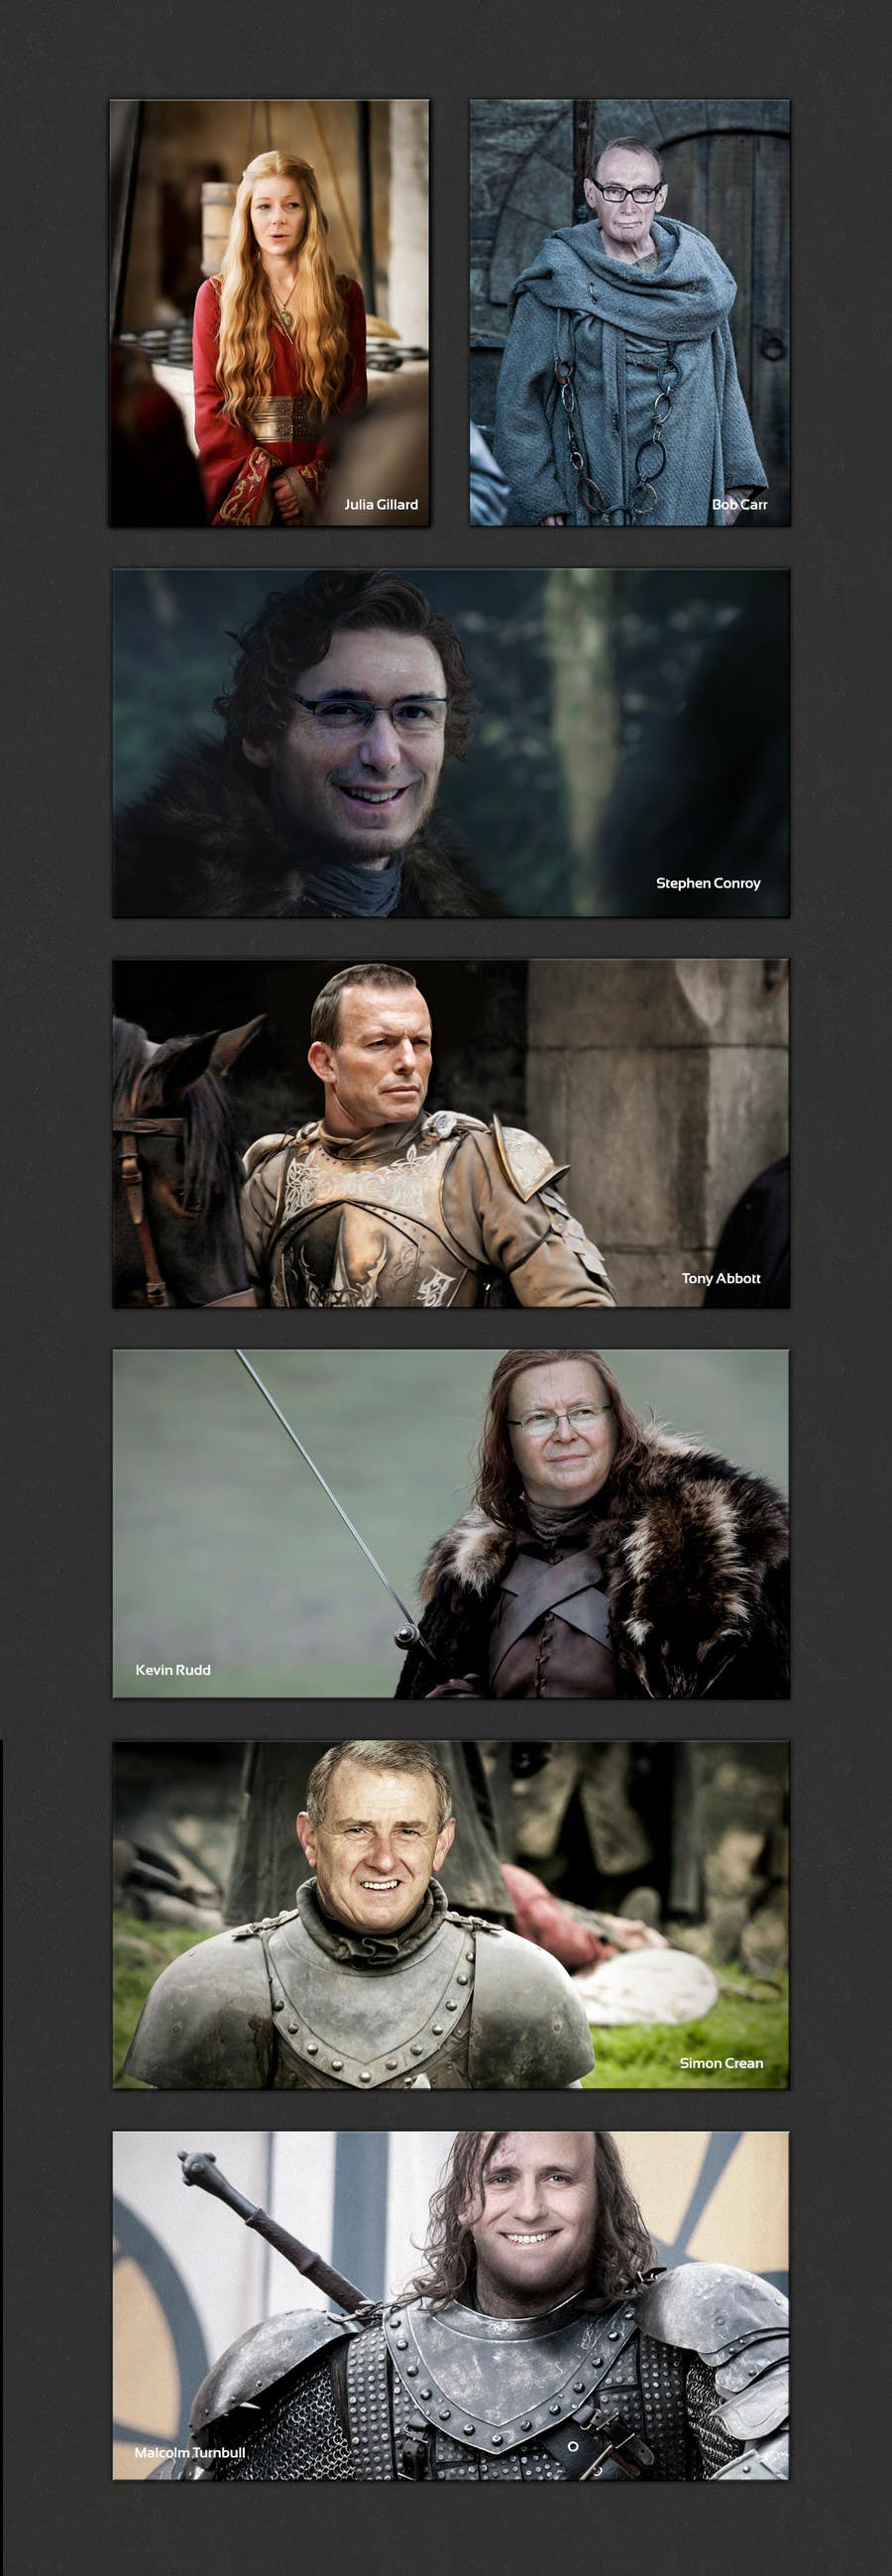 Penyertaan Peraduan #128 untuk Photoshop Aussie Politicians into Game of Thrones Mashup